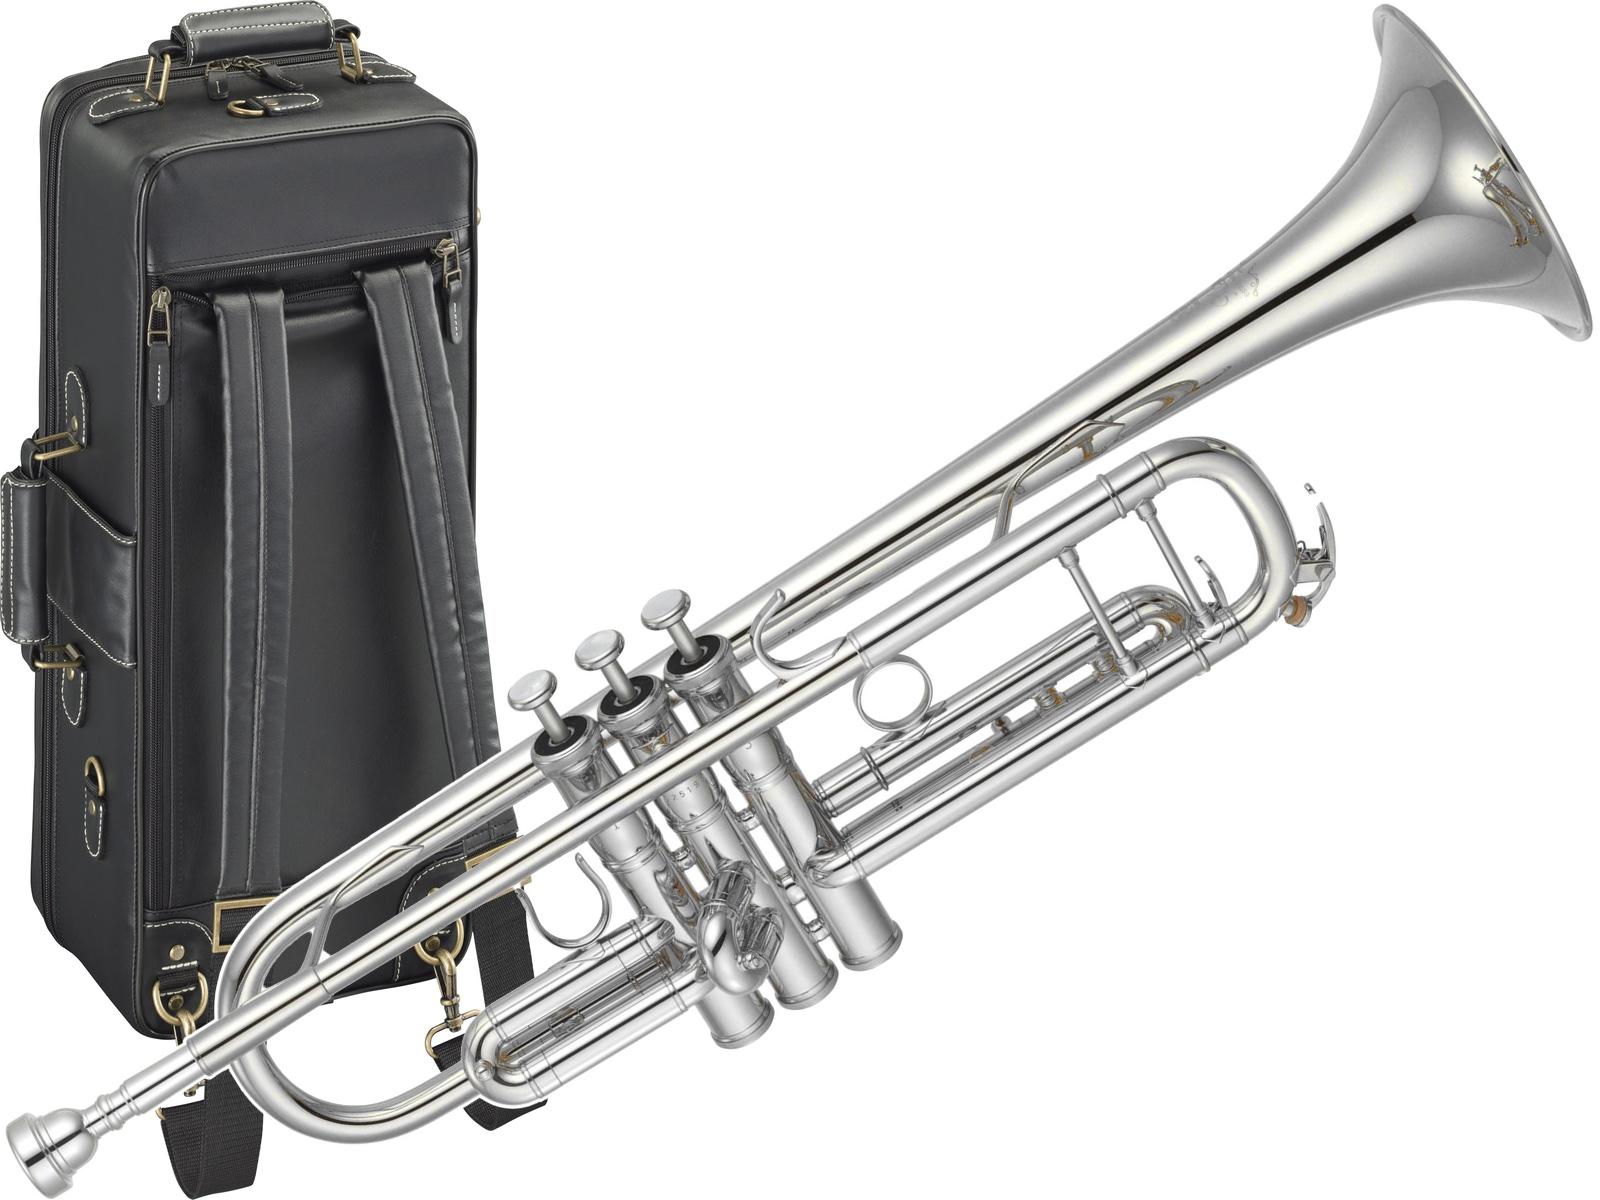 YAMAHA ( ヤマハ ) YTR-8335S トランペット 正規品 Xeno ゼノ 銀メッキ シルバー カスタム 楽器 B♭ Trumpets custom 北海道 沖縄 離島不可